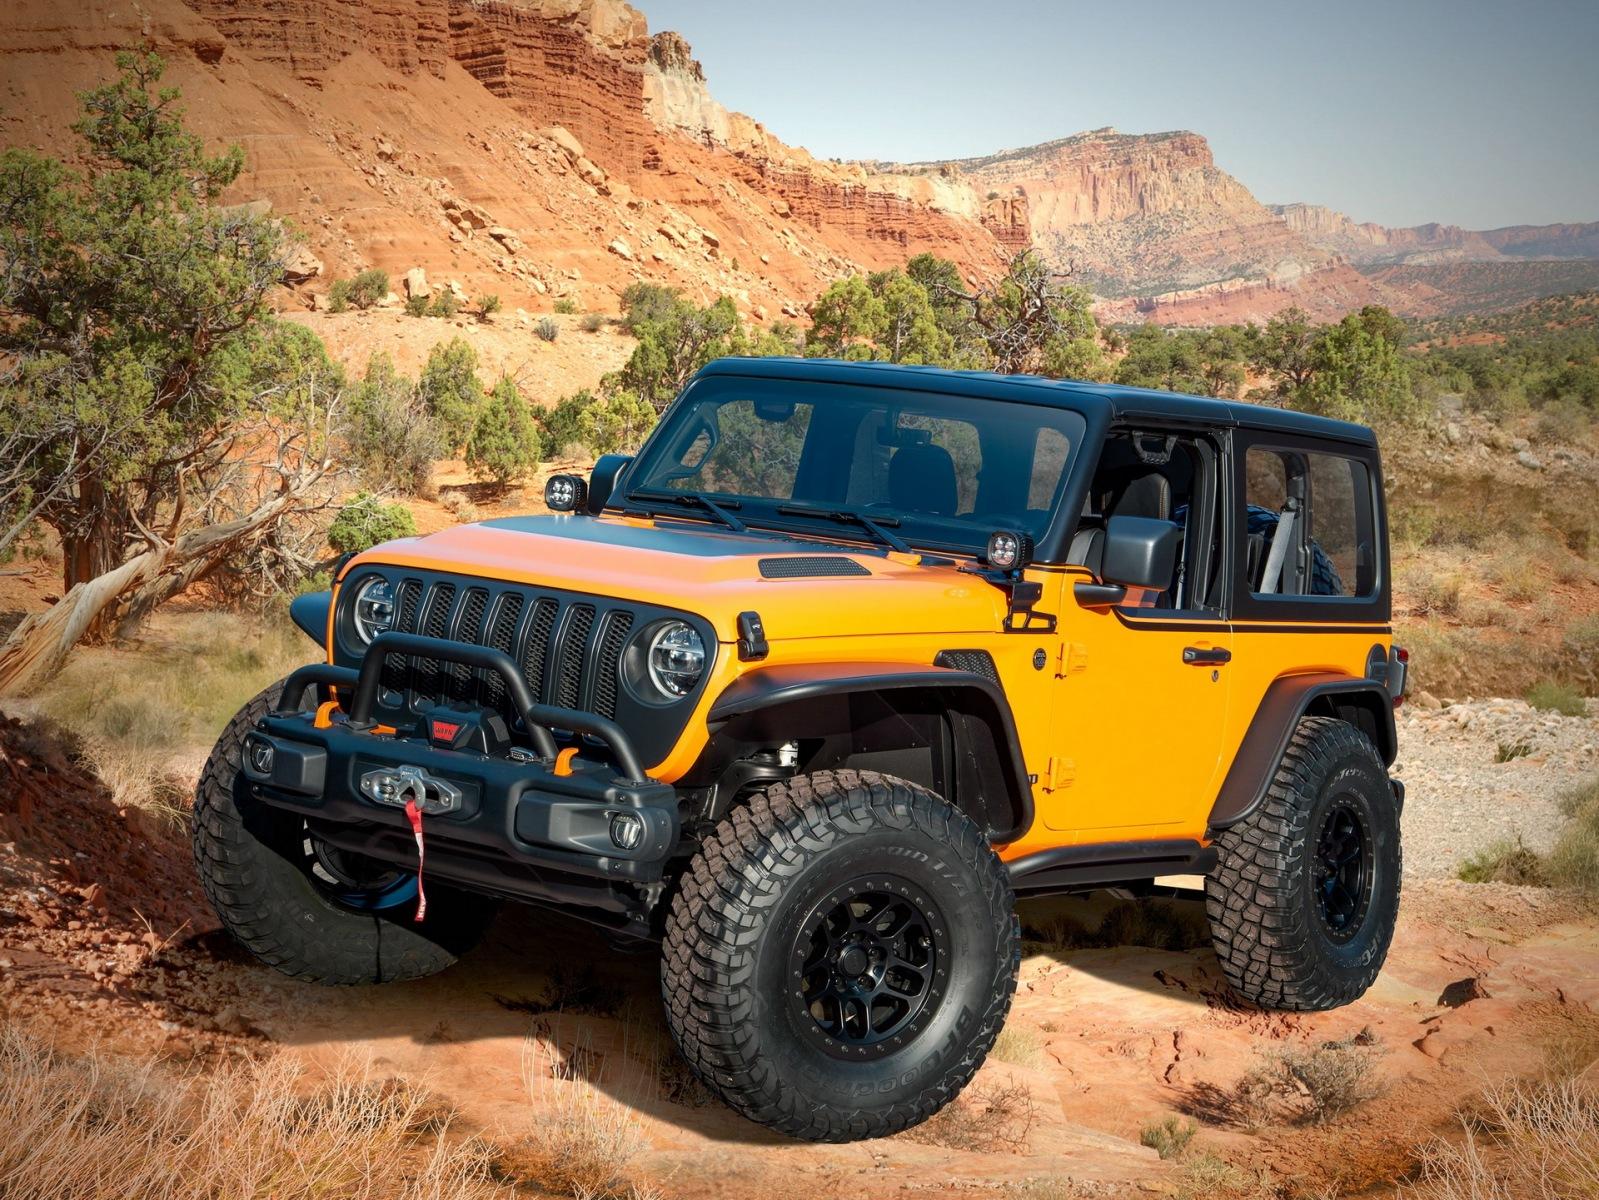 Jeep Wrangler Concept - Easter Jeep Safari 2021